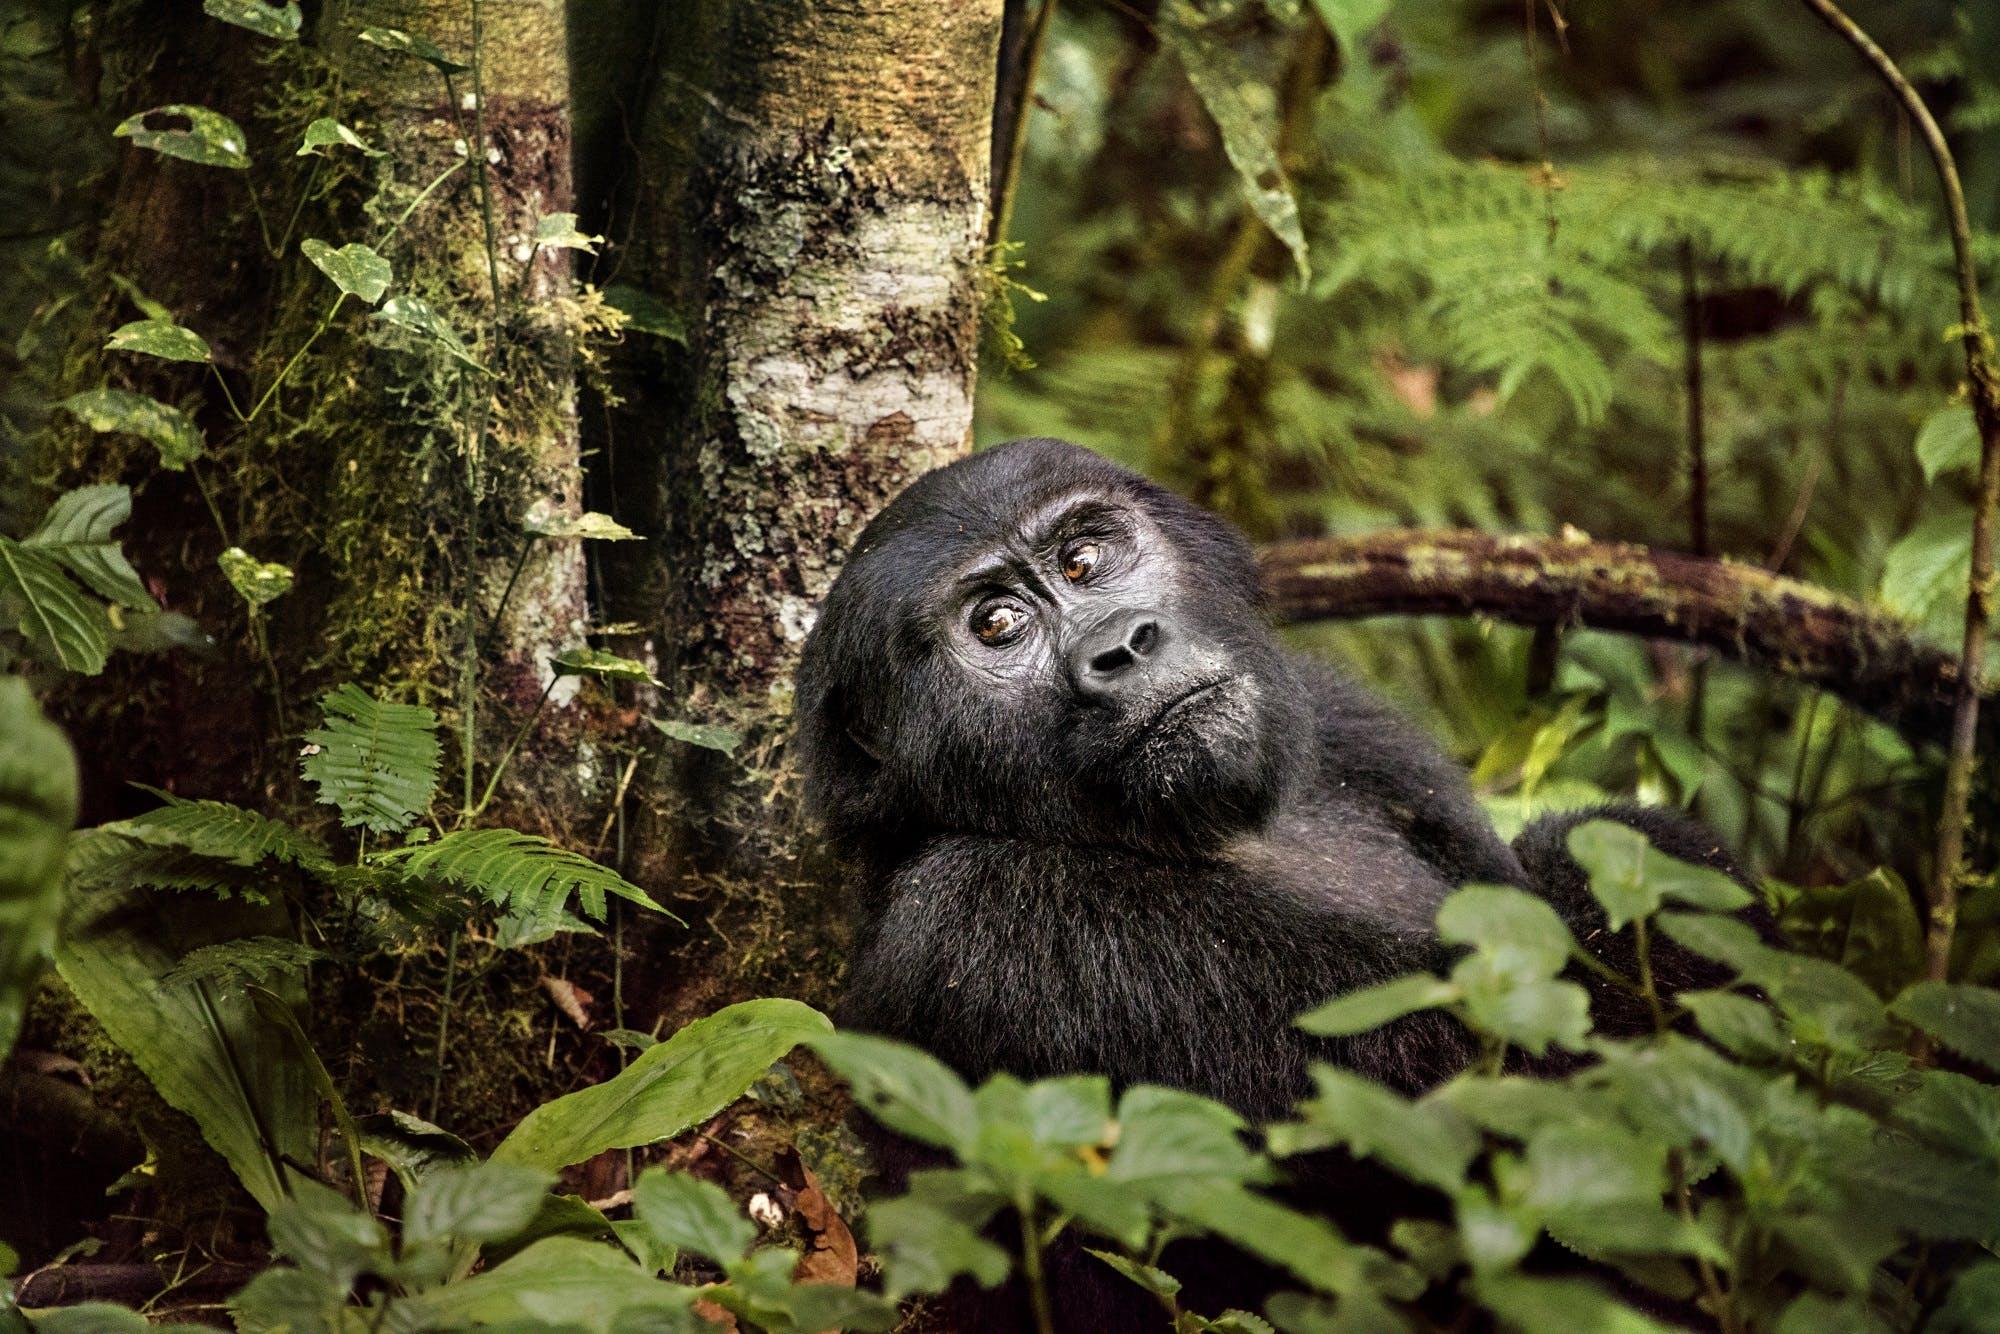 Uganda by Steve McCurry